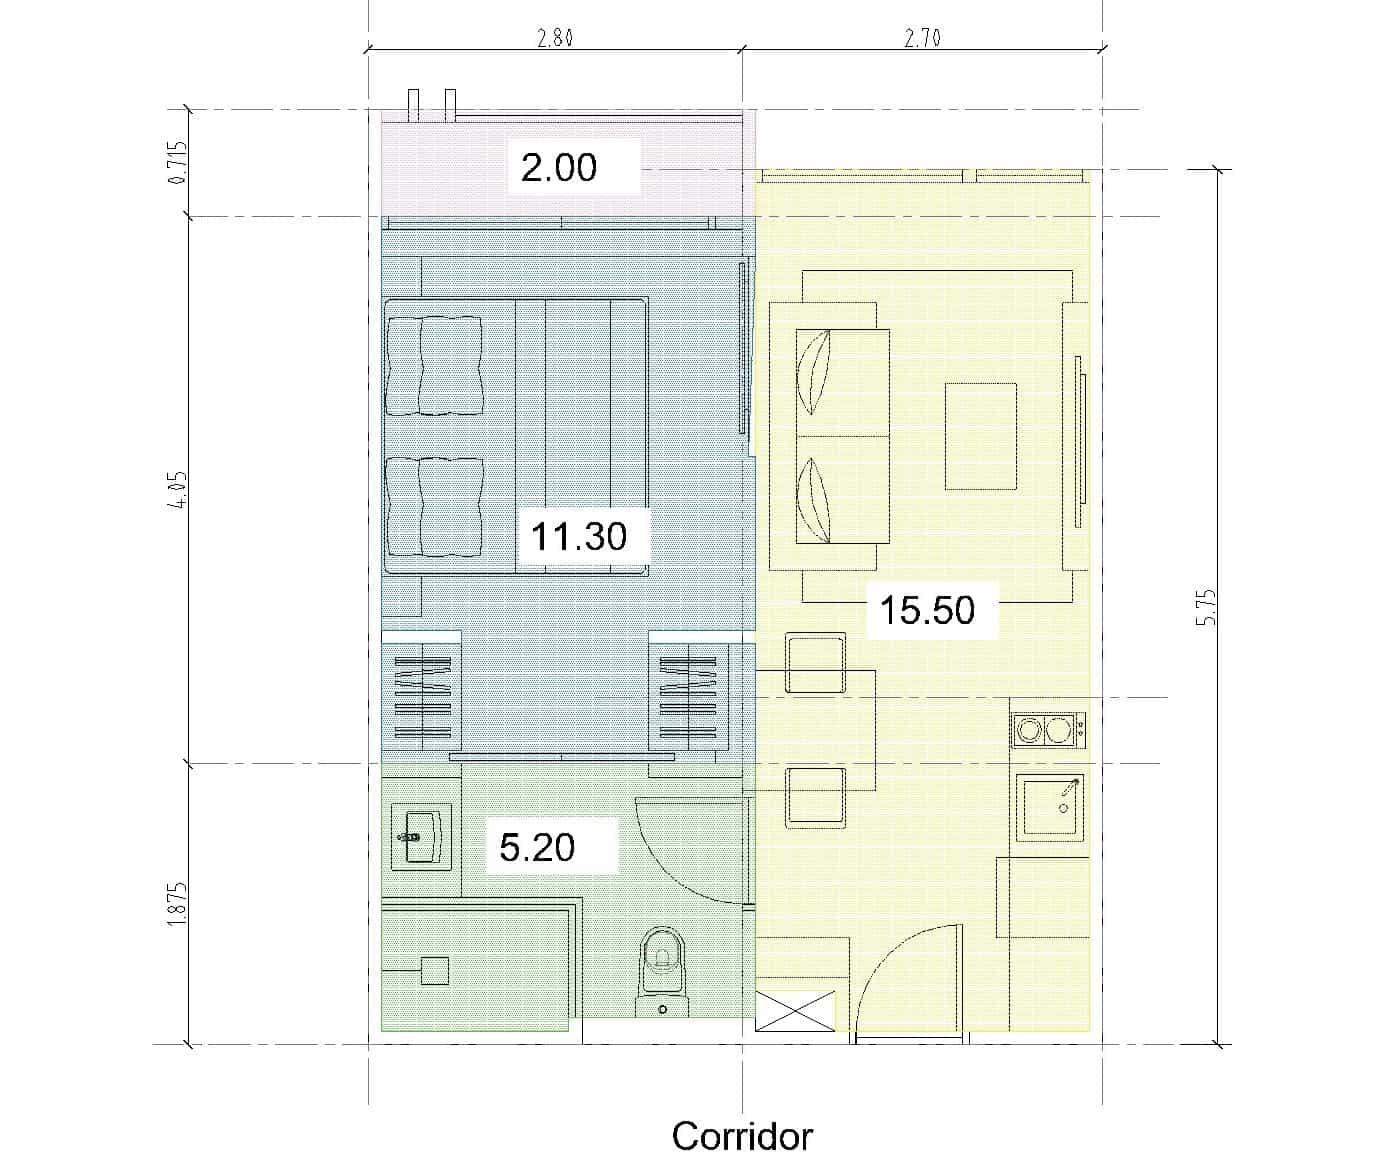 PBR3 Room Layout